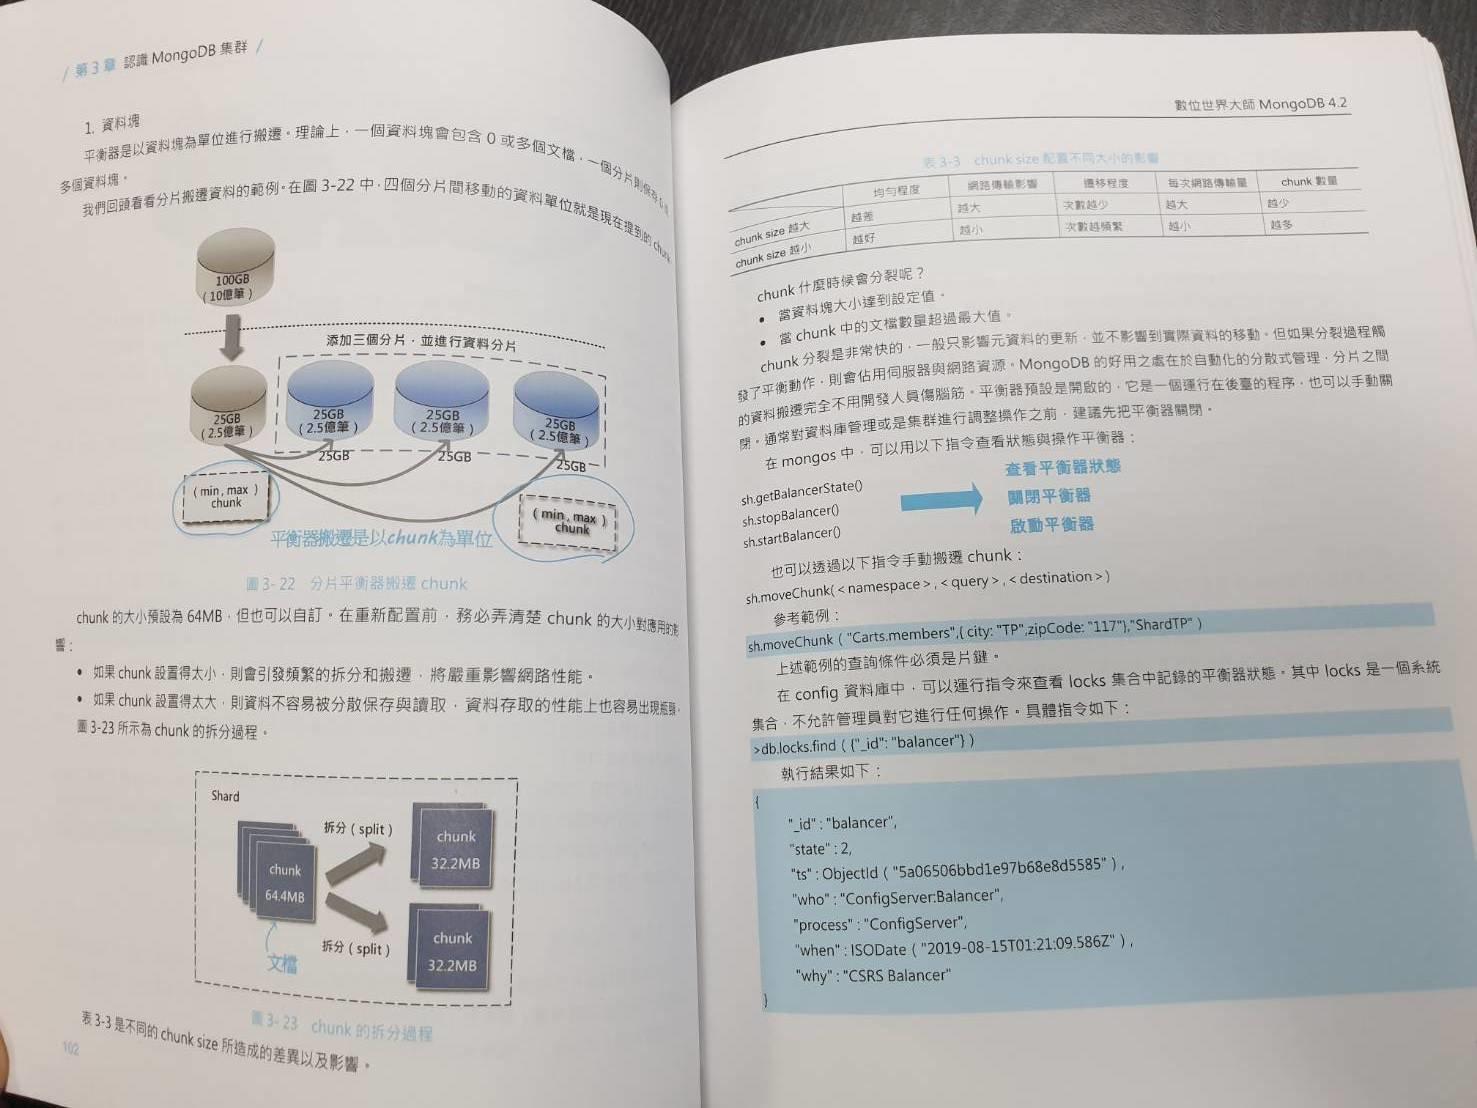 數位世界大師 MongoDB 4.2 版-preview-3